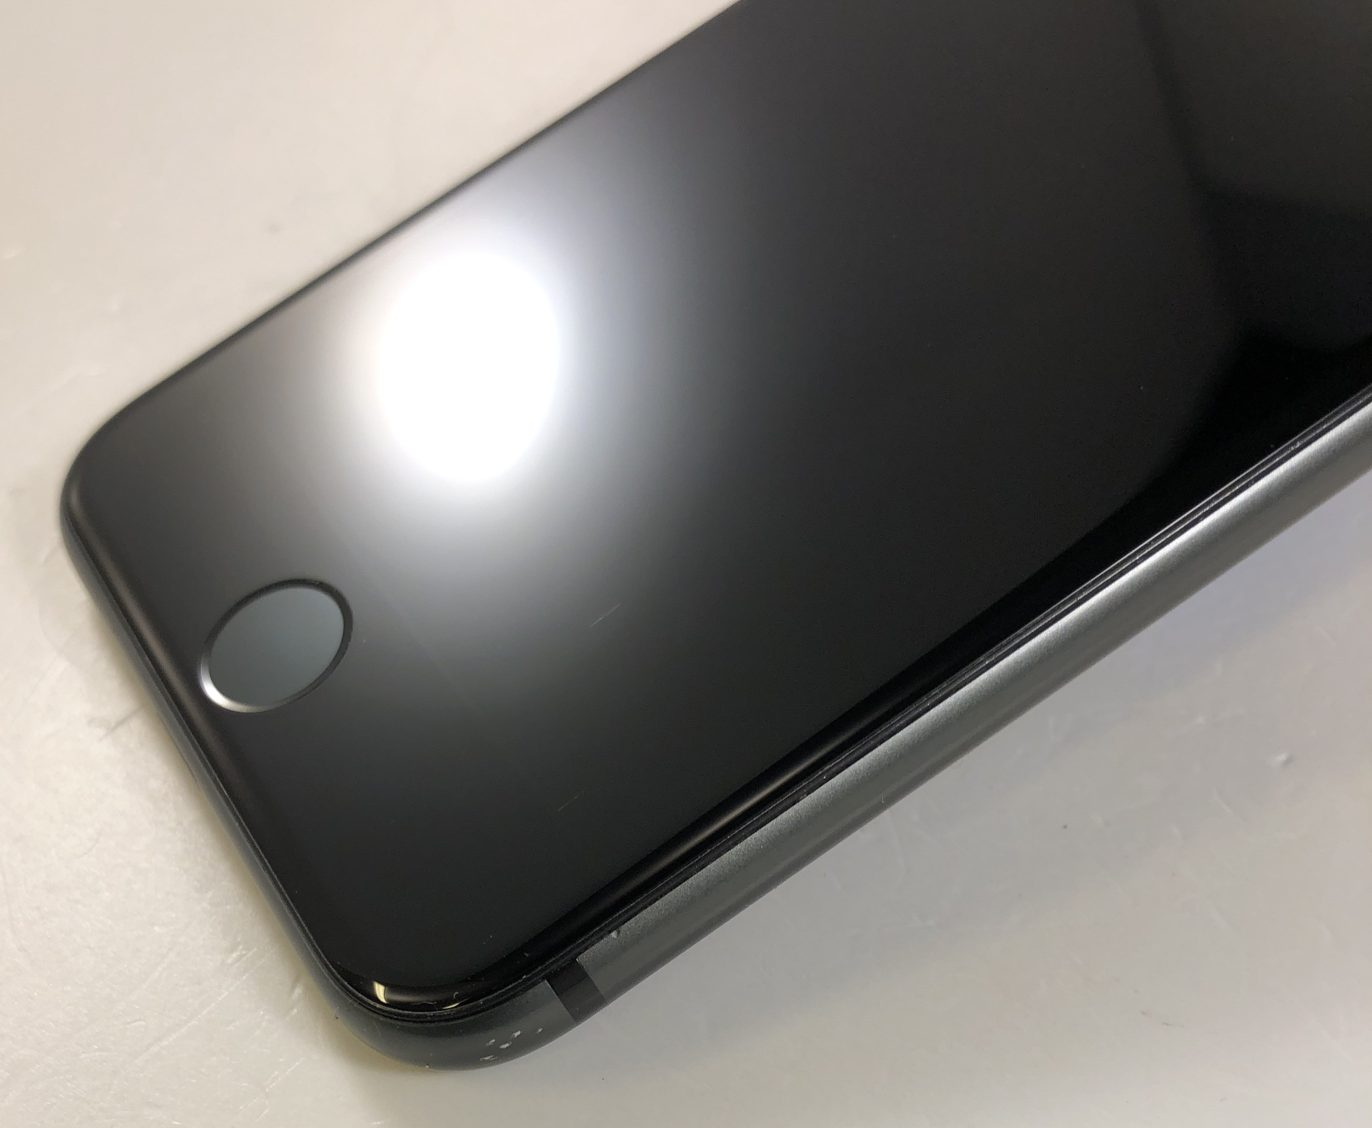 iPhone 8 64GB, 64GB, Space Gray, bild 6